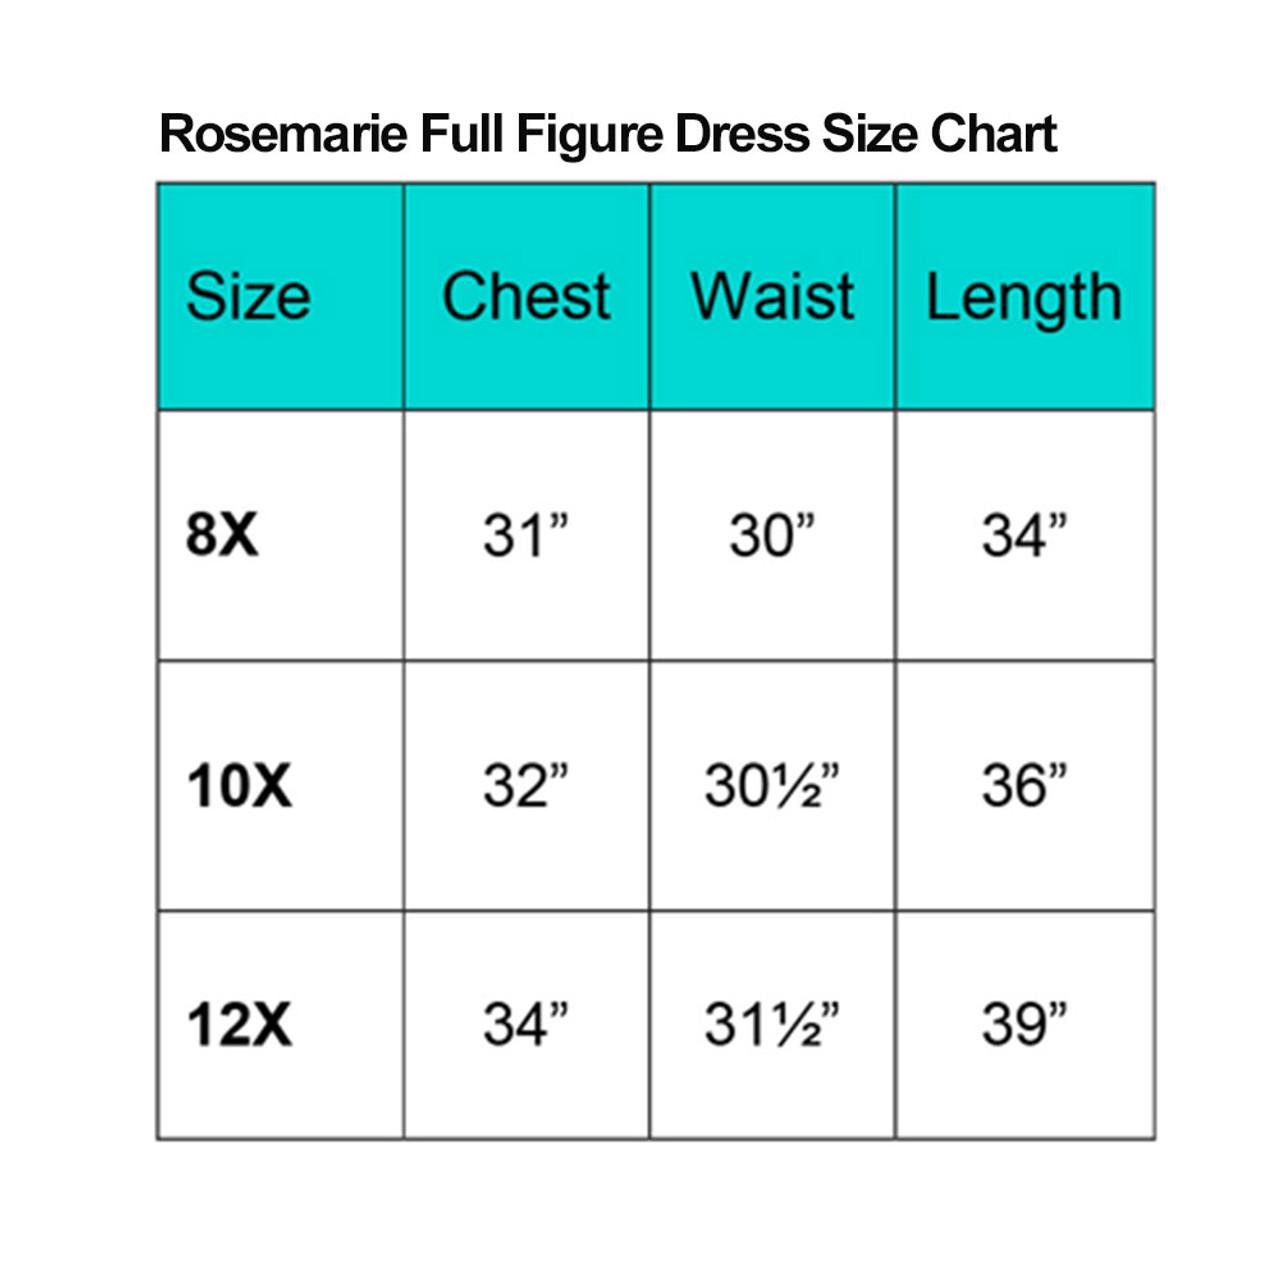 Rosemarie Communion Full Figure Size Chart